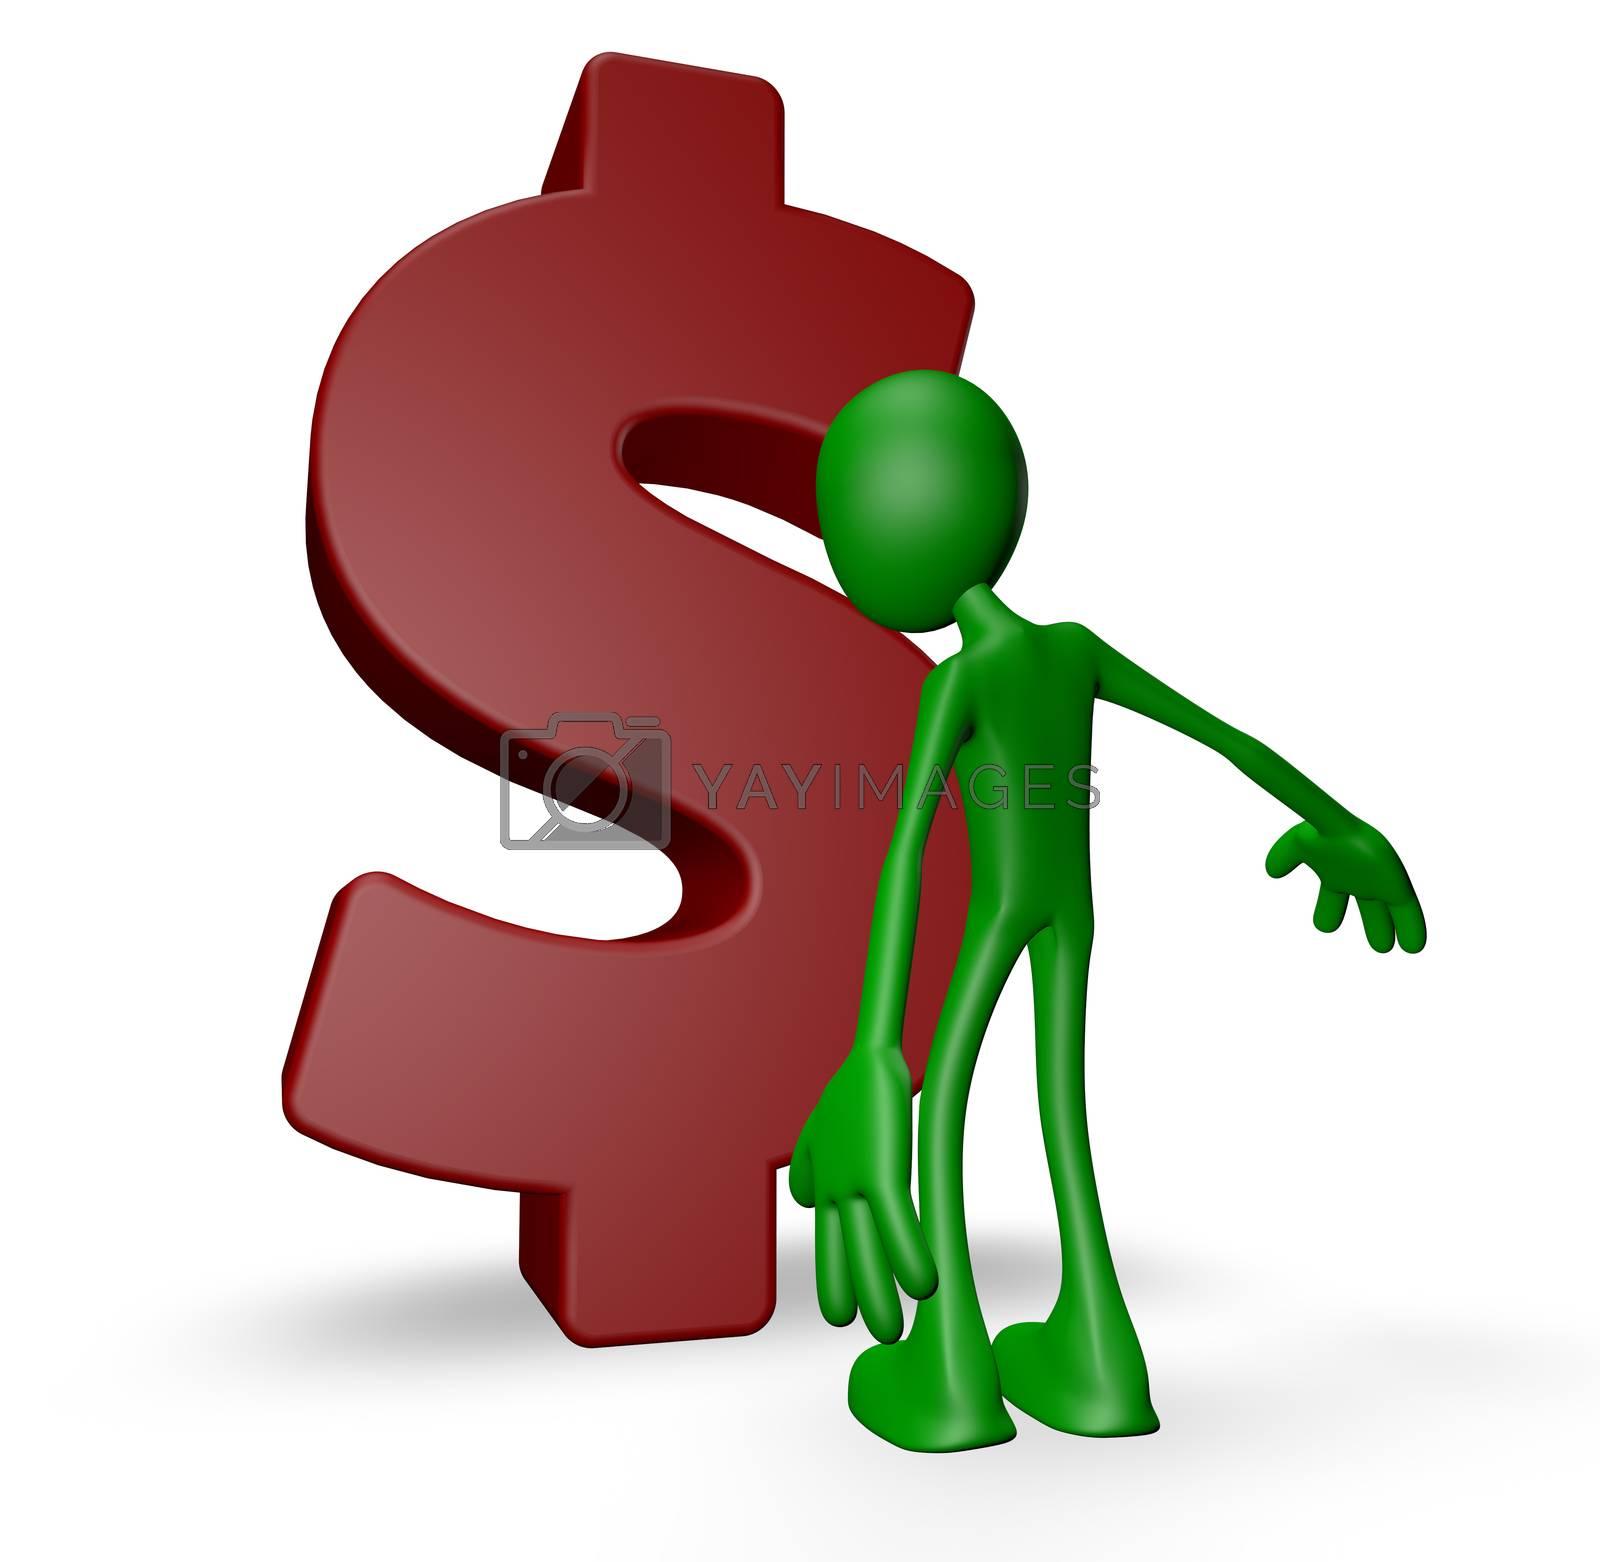 green guy and dollar symbol - 3d illustration